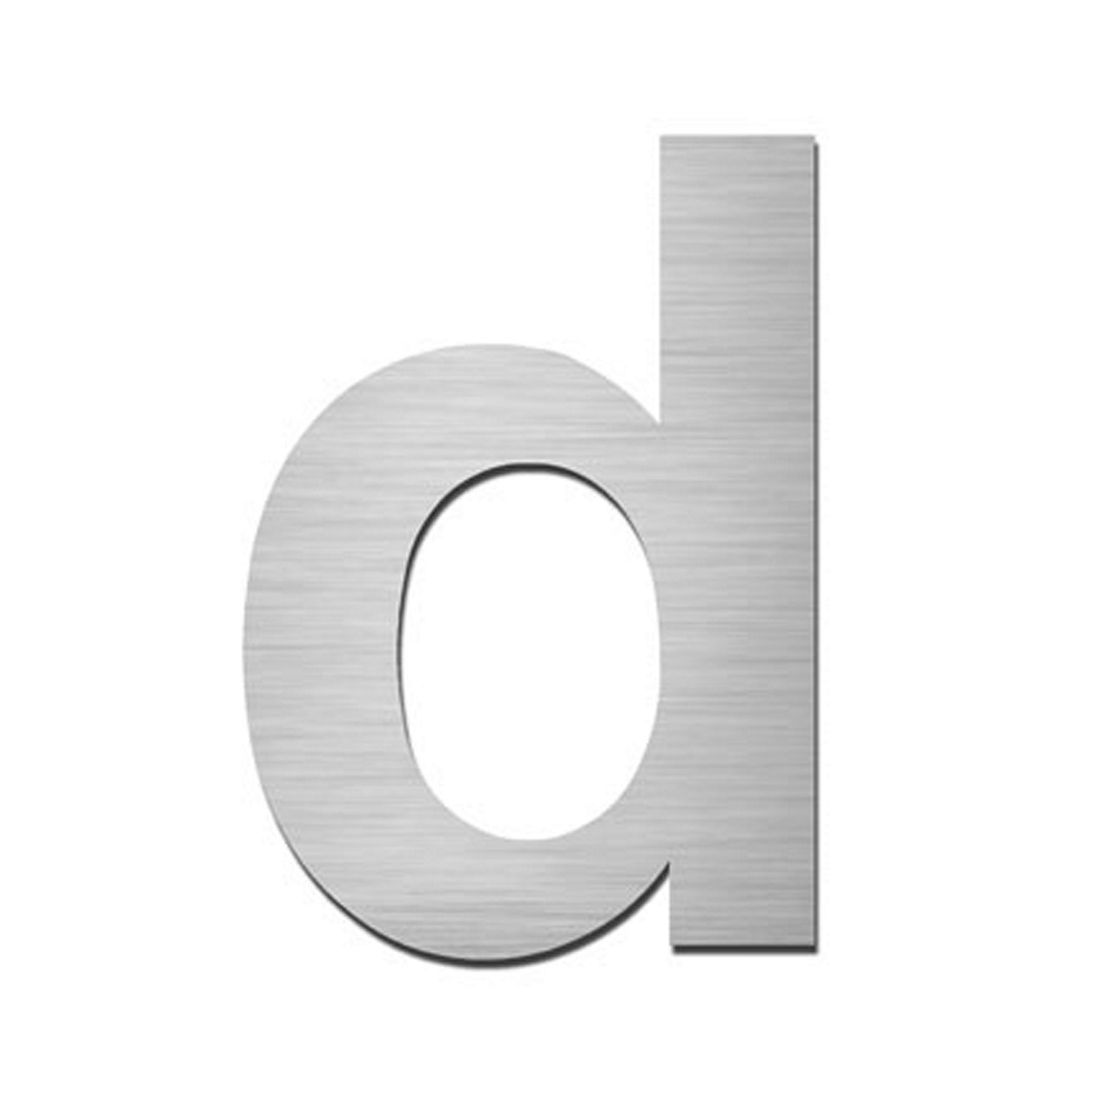 Hausnummer Index zum Aufkleben d - Matt Gebürstet Edelstahl Silber, Serafini